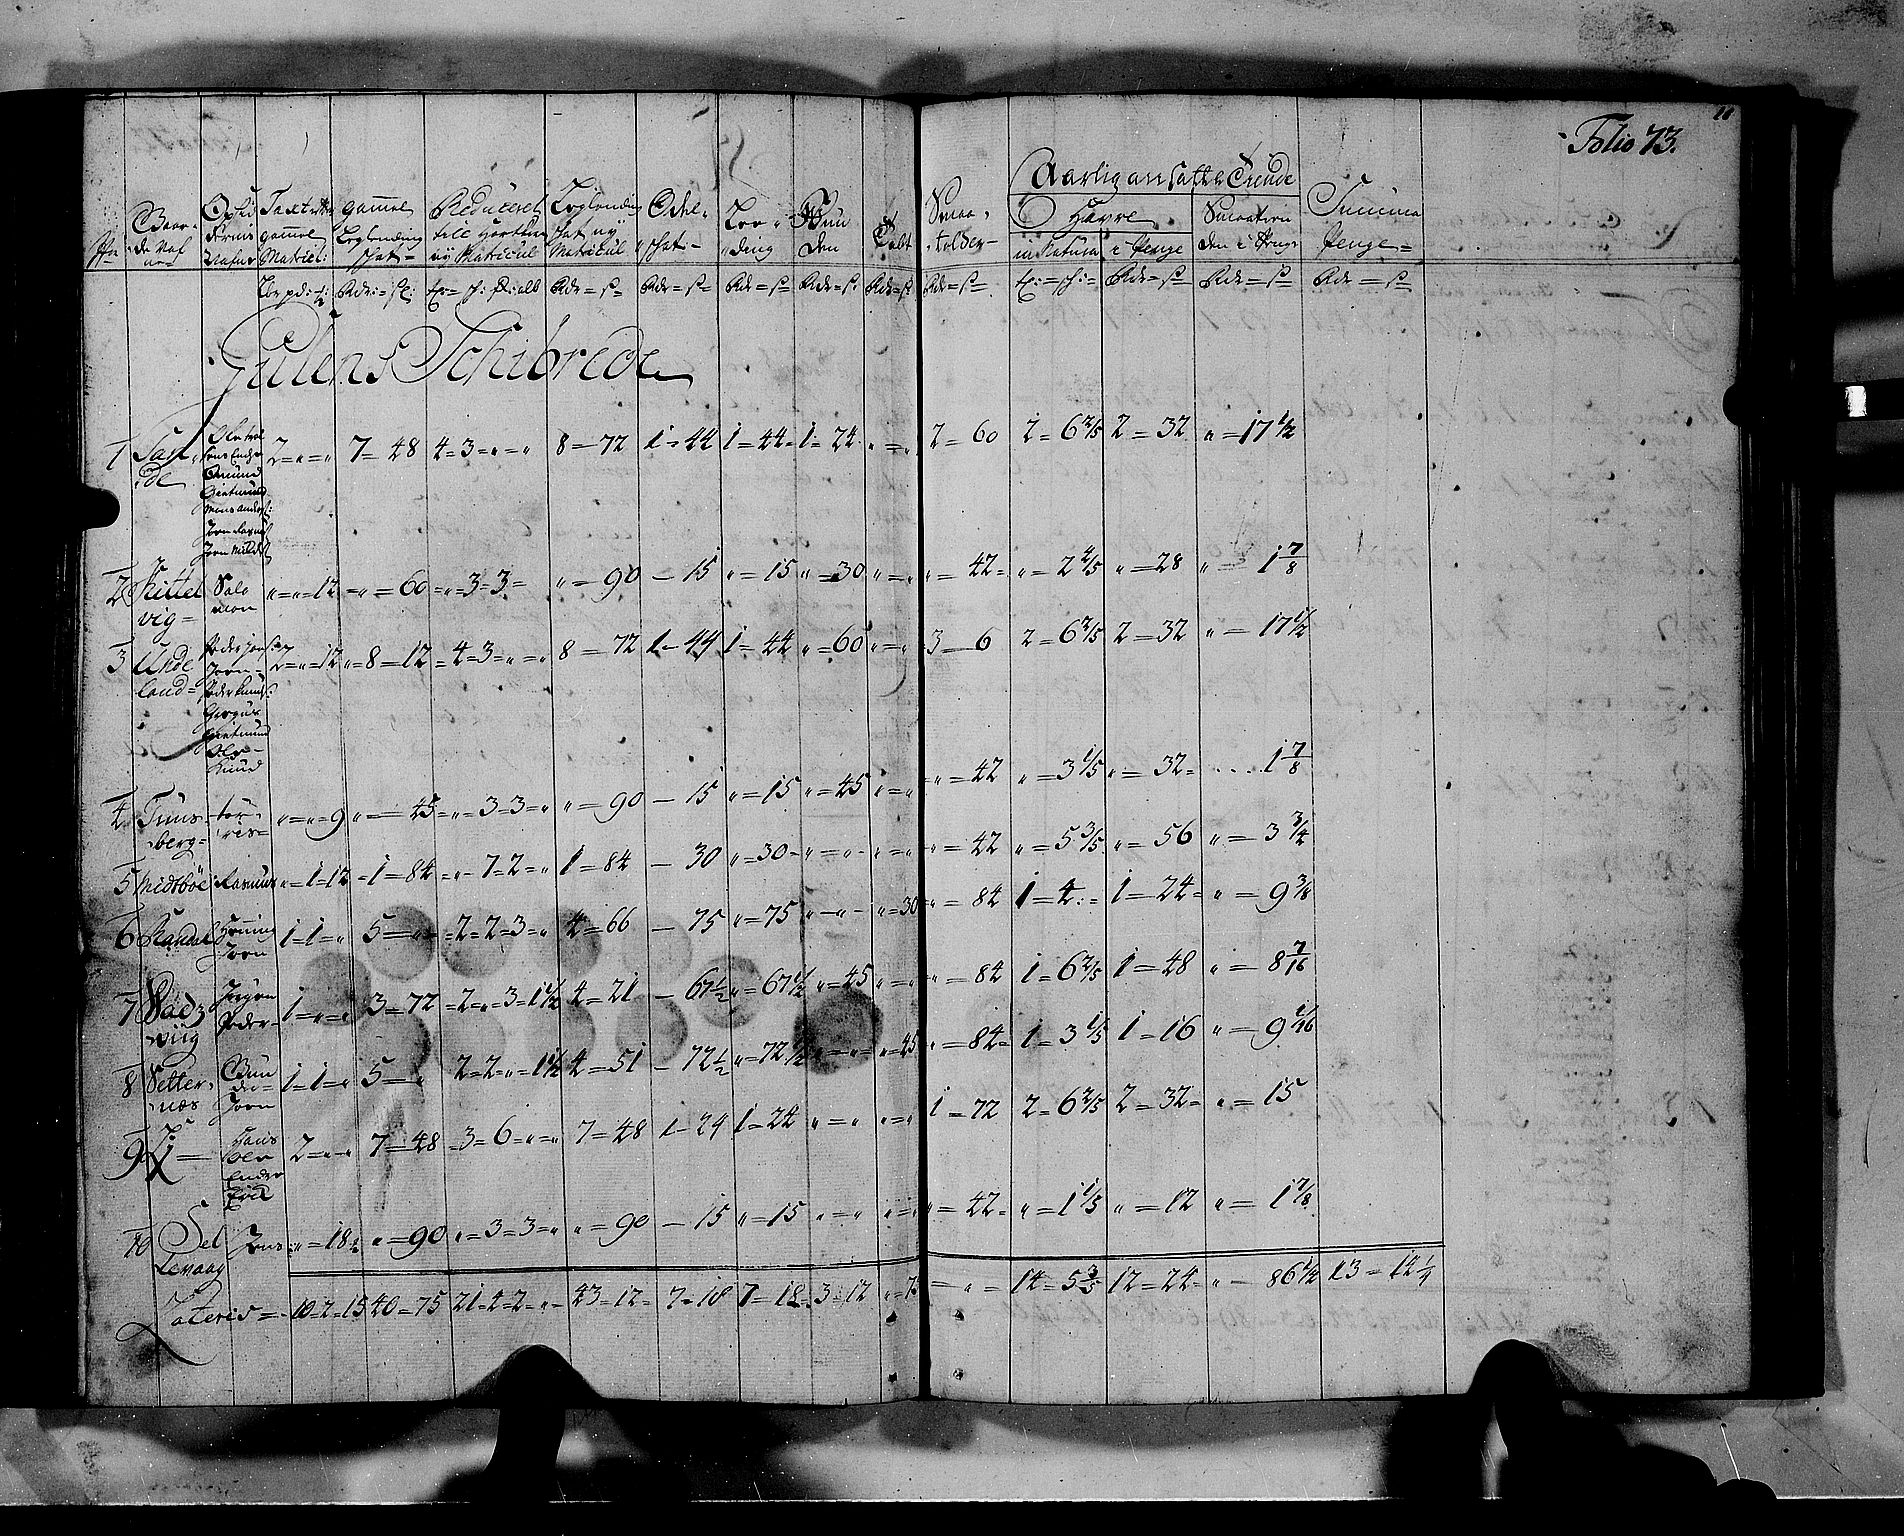 RA, Rentekammeret inntil 1814, Realistisk ordnet avdeling, N/Nb/Nbf/L0140: Nordhordland matrikkelprotokoll, 1723, s. 72b-73a